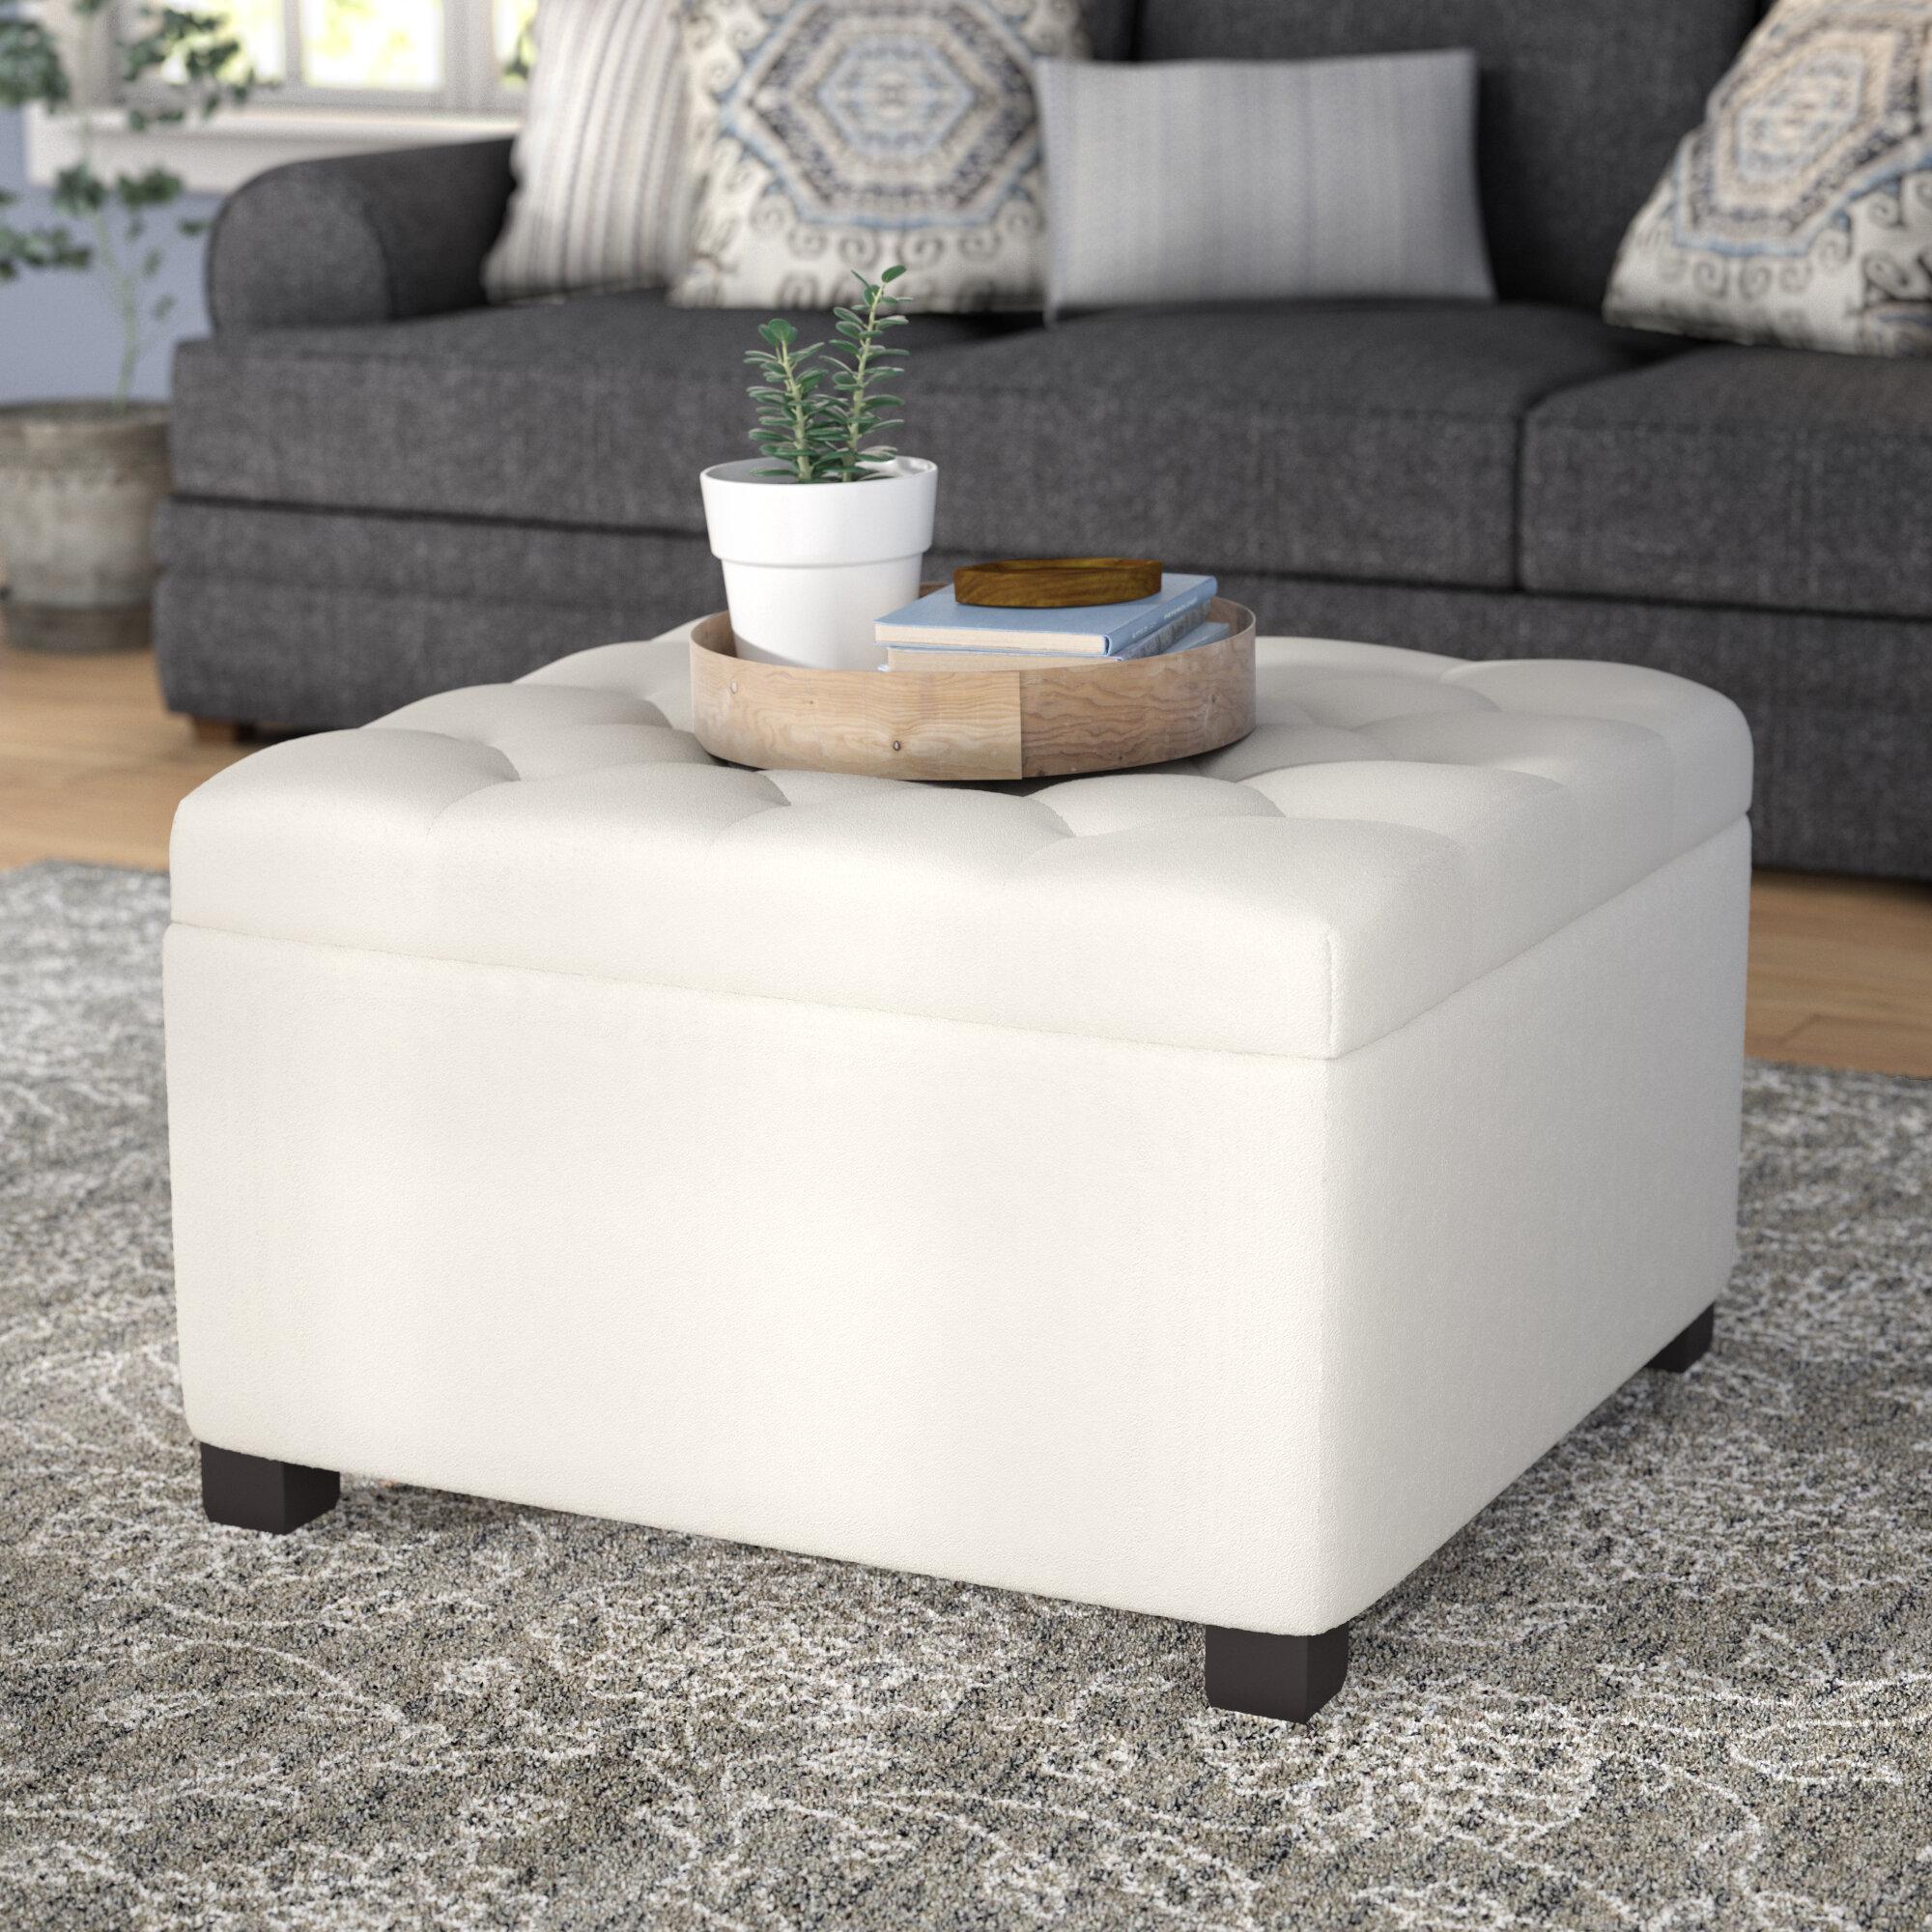 Darby Home Co Avis Storage Ottoman & Reviews | Wayfair